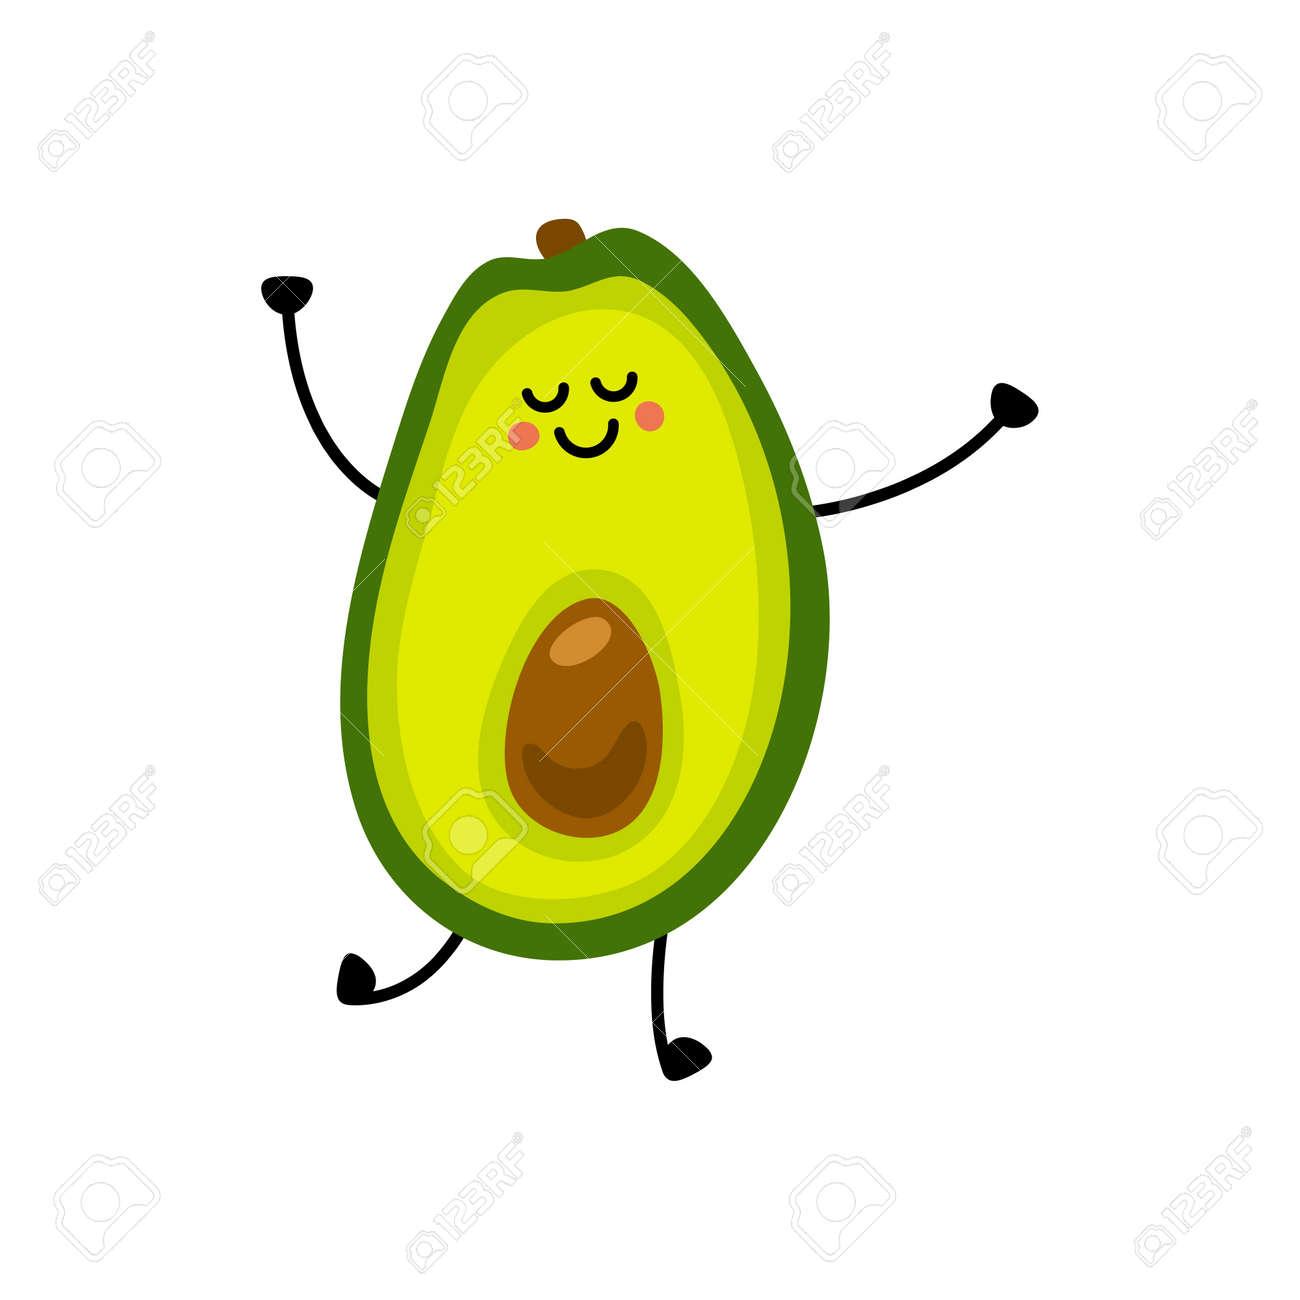 Avocado icon. Flat illustration of avocado vector icon isolated on white background. - 169772074